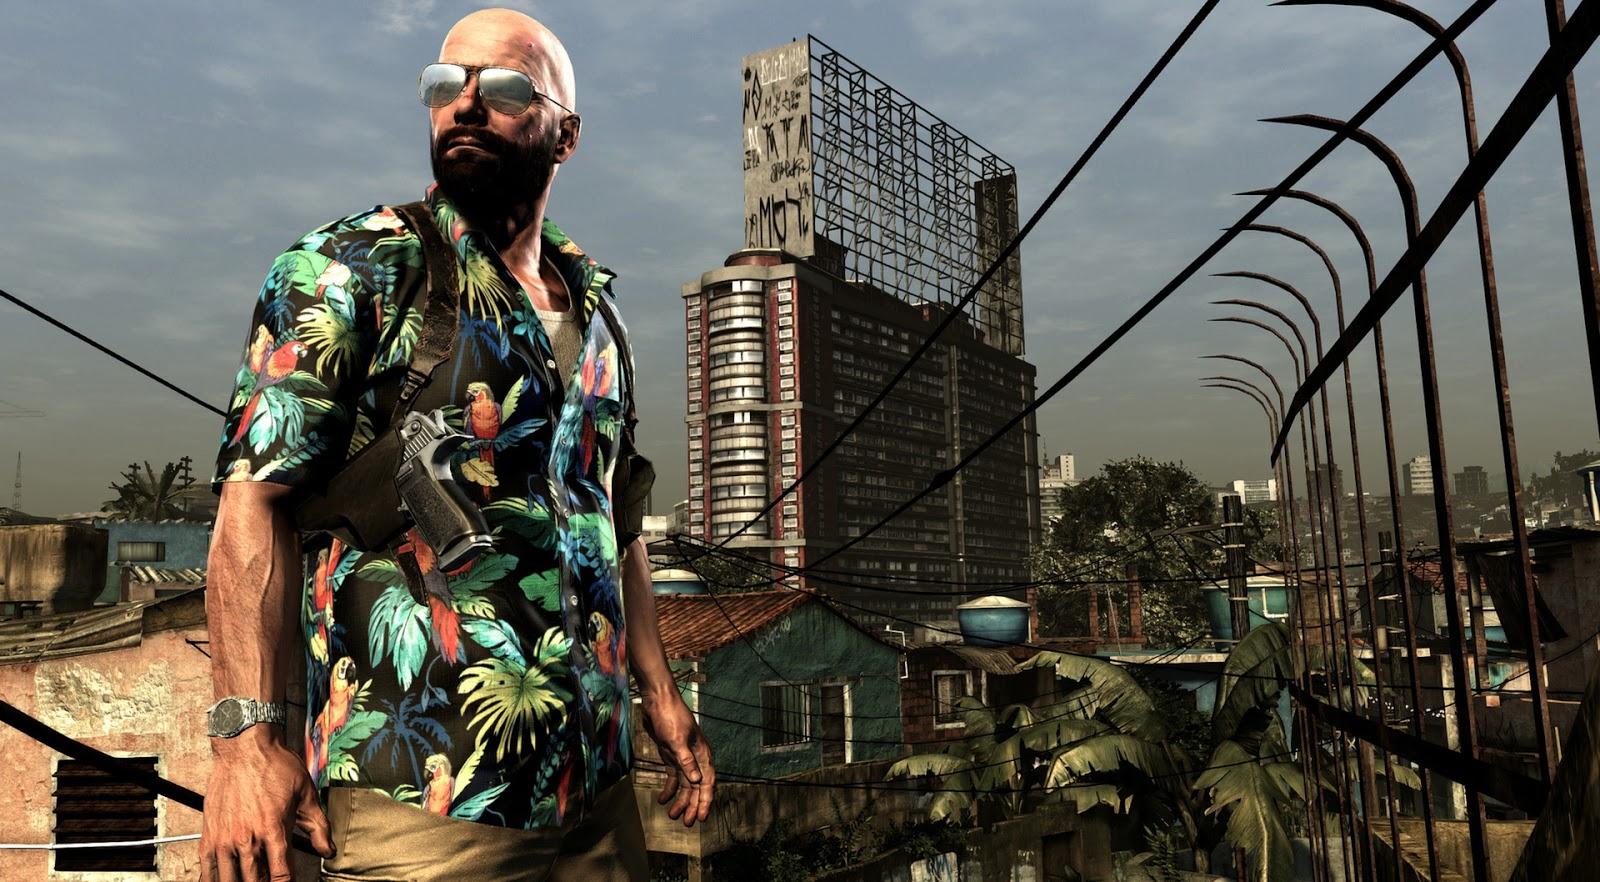 Max Payne 3 Complete Edition ESPAÑOL PC Descargar Full (RELOADED) + REPACK 5 DVD5 (JPW) 10